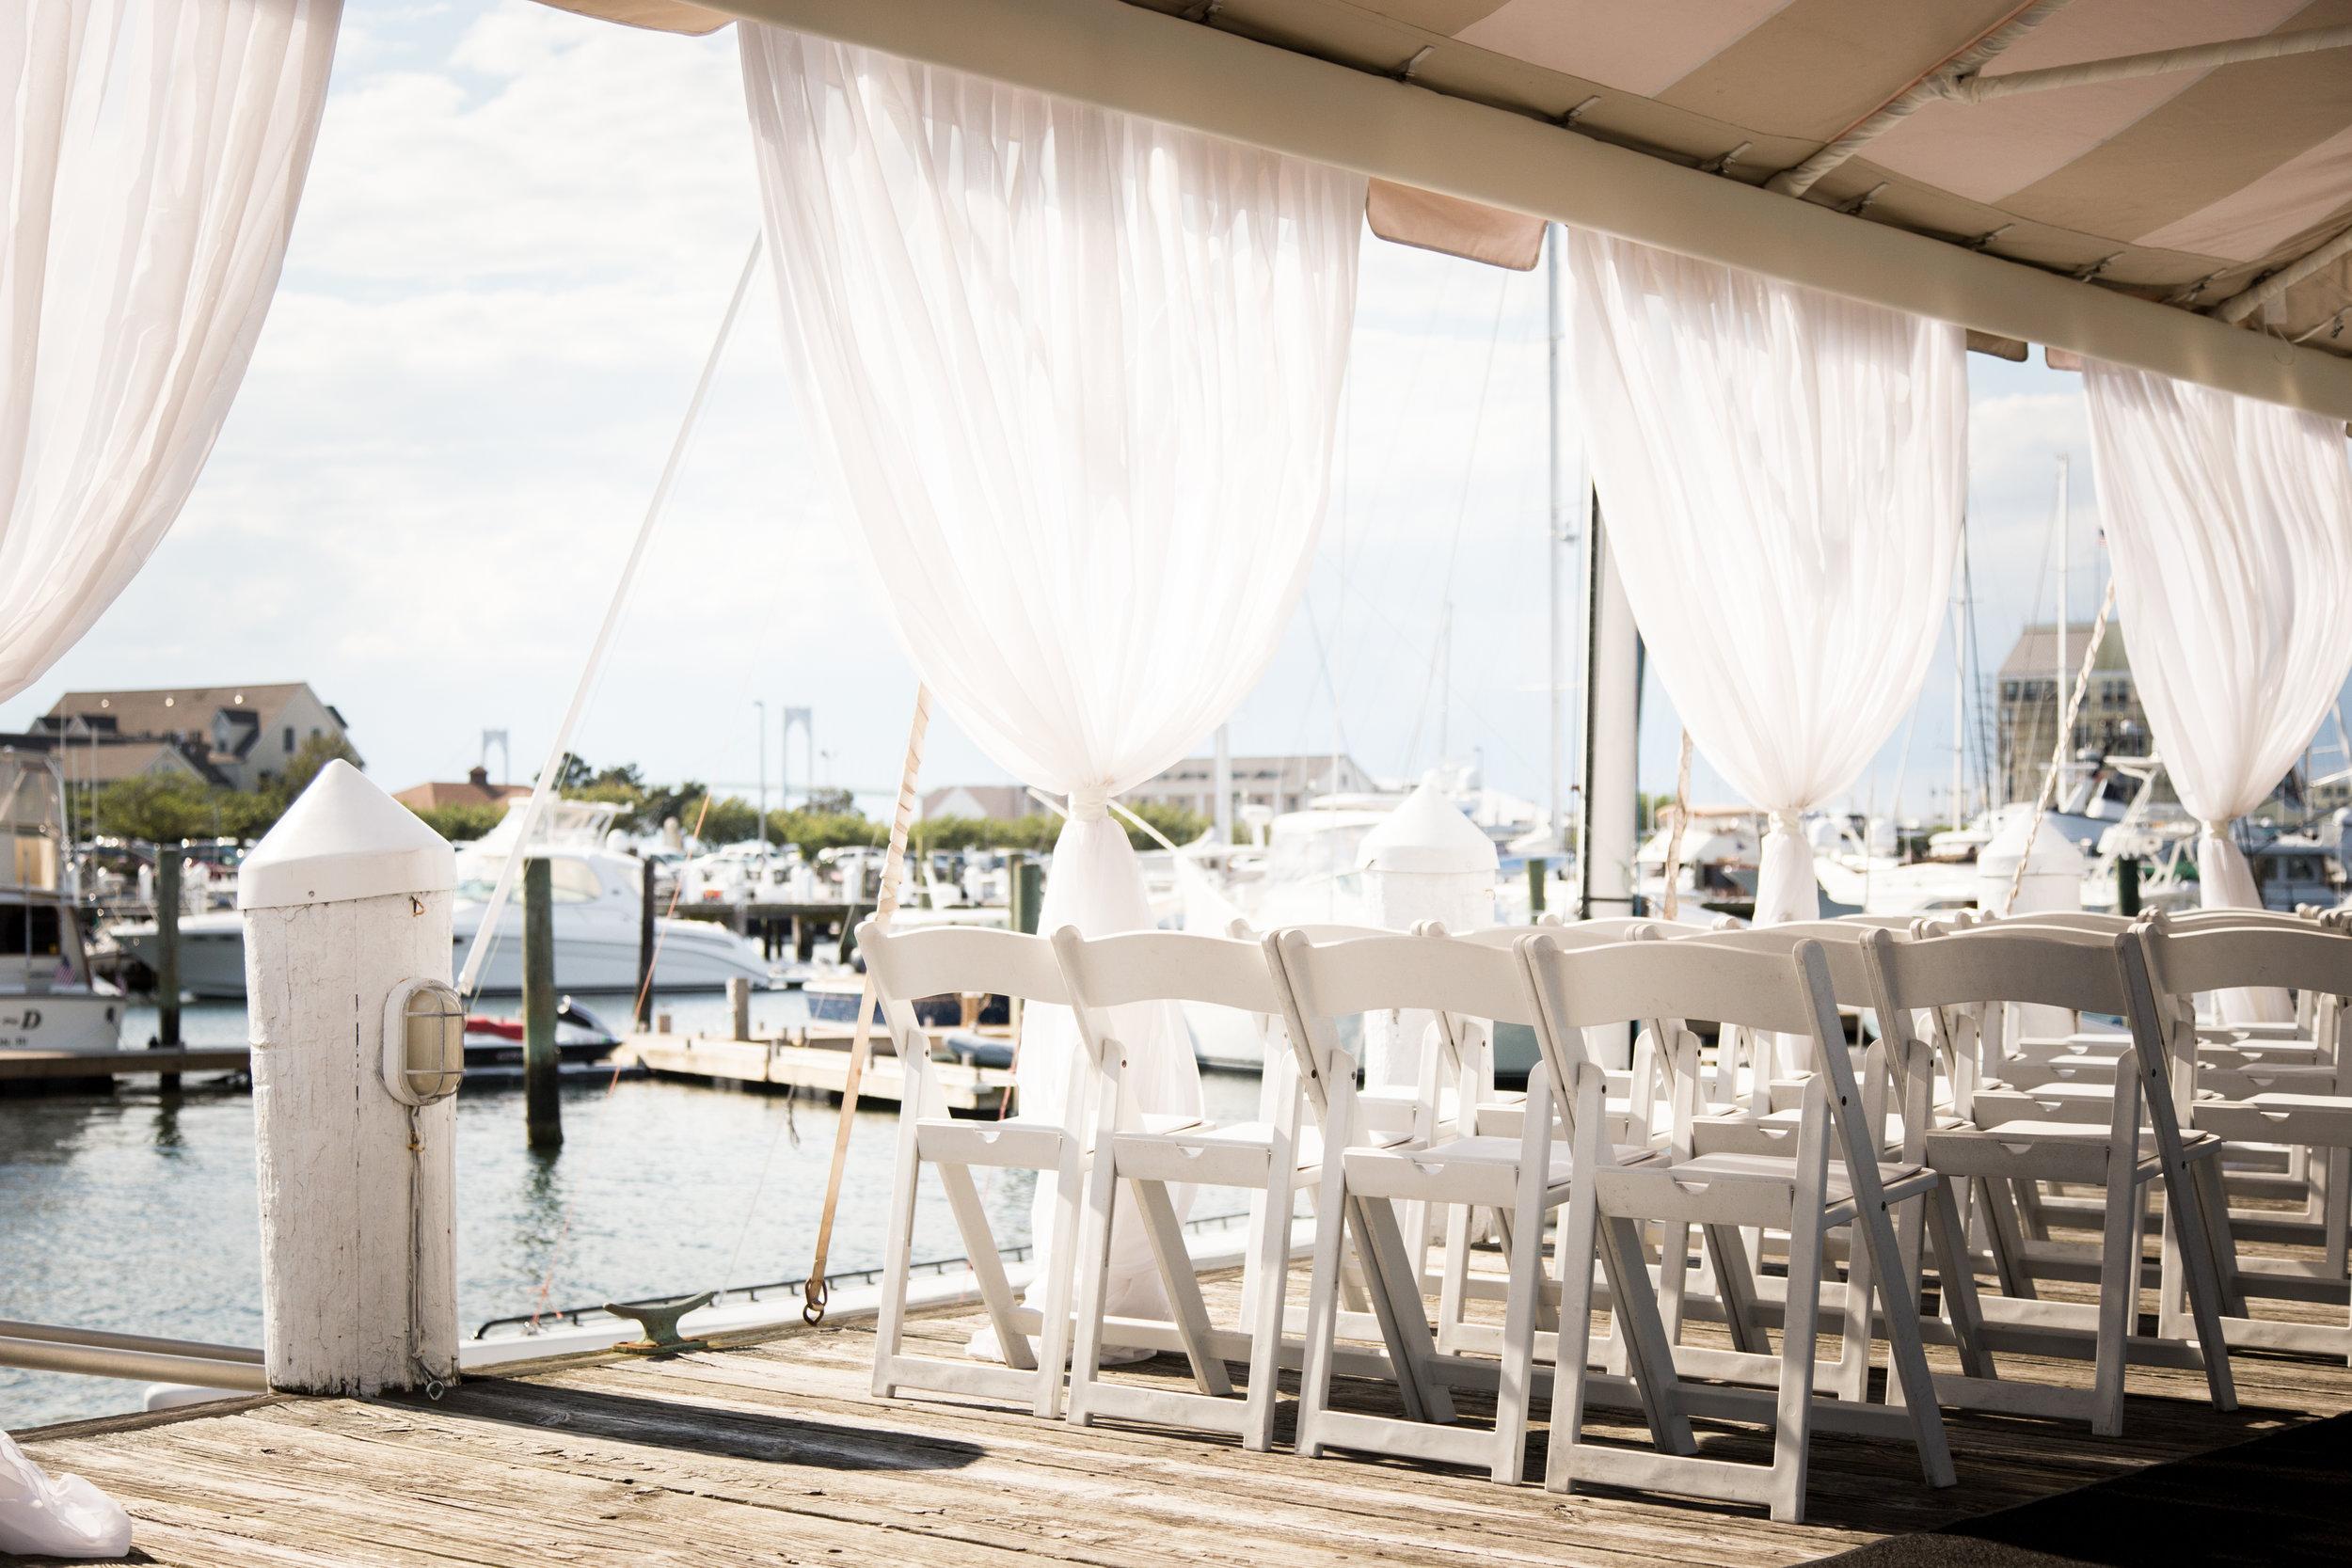 regattaplacewedding